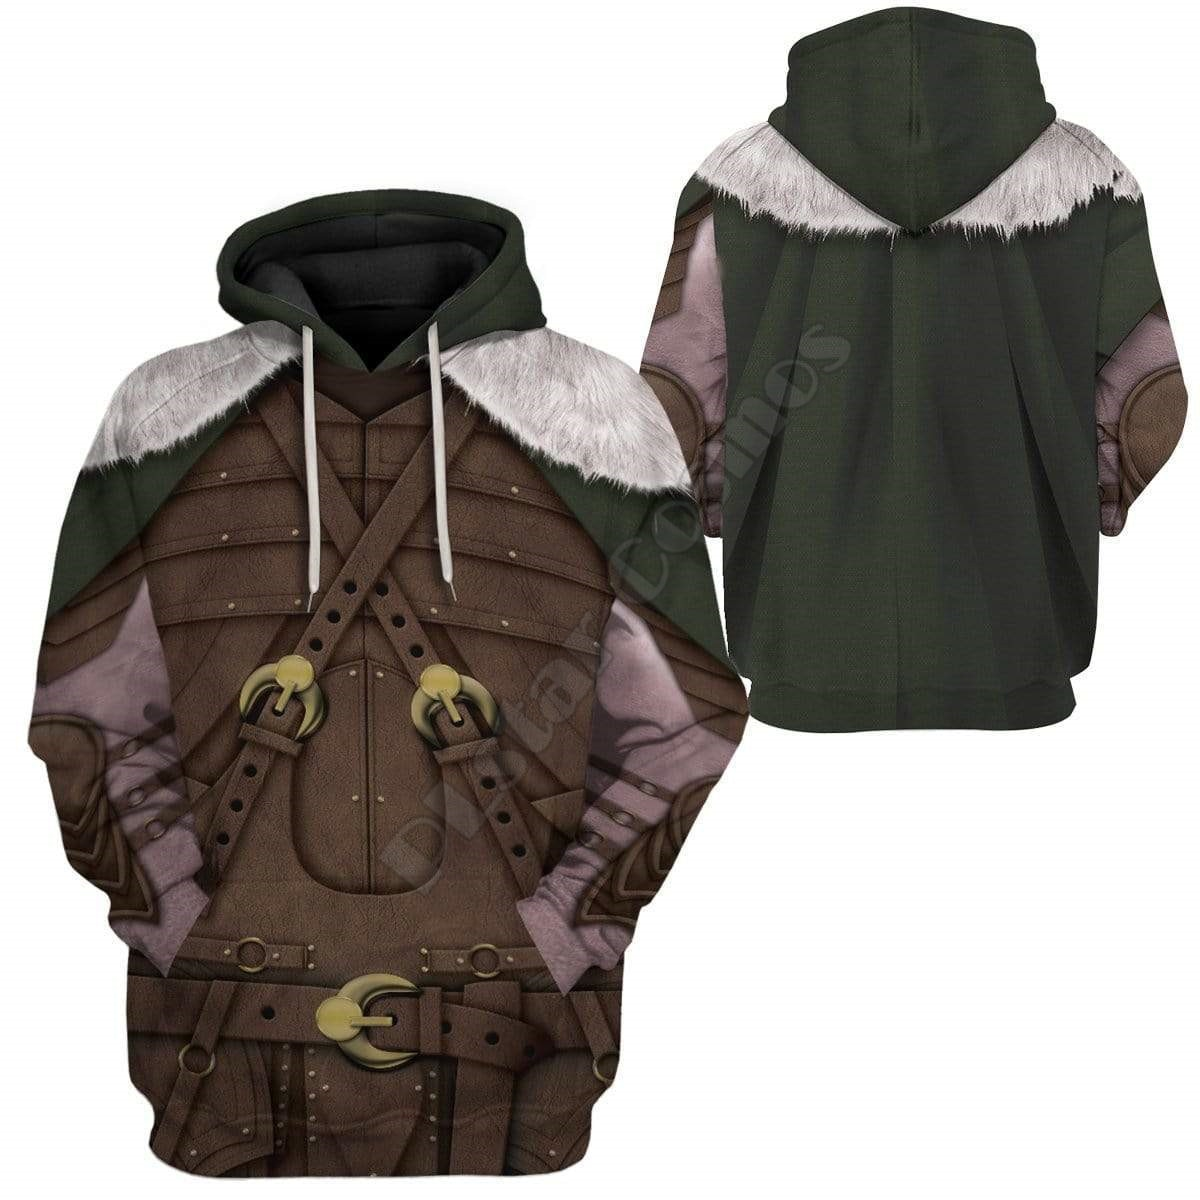 Classic Game Characters Cosplay Costumes 3D Printed Men For Women hoodies Streetwear Fashion Hoodie/Sweatshirts Unisex Jacket 04